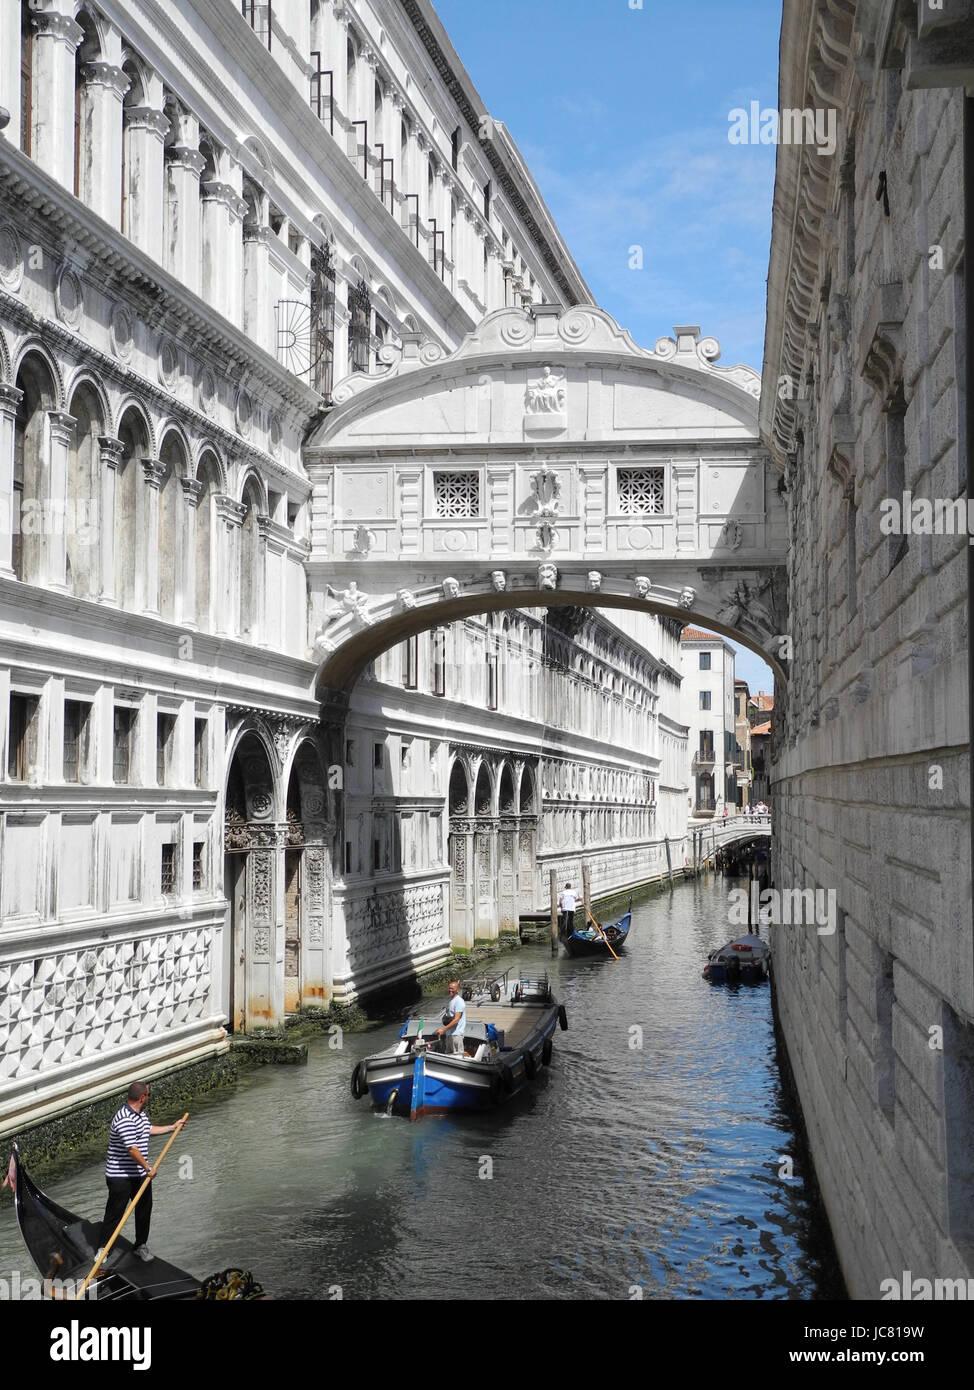 Seufzerbrücke, seufzer-brücke, brücke, Venedig, kanal, wasser, gewässer, italien,  norditalien, - Stock Image